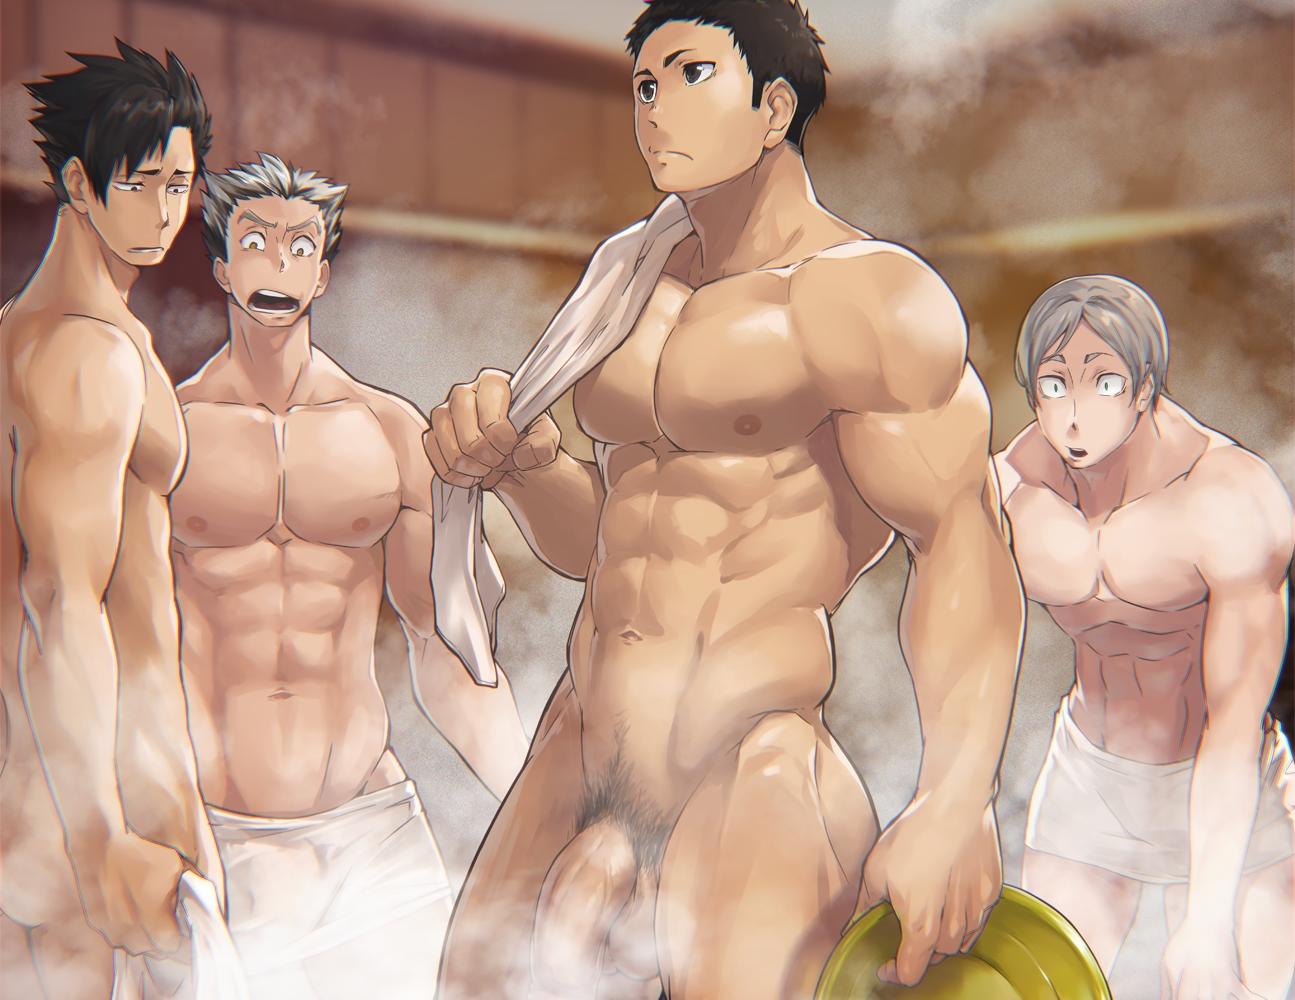 8_(yamalu) all_male black_hair bokuto_koutarou cropped gray_hair group haikyuu!! kuroo_tetsuro male navel nipples nude penis pubic_hair sawamura_daichi short_hair sugawara_koushi towel uncensored